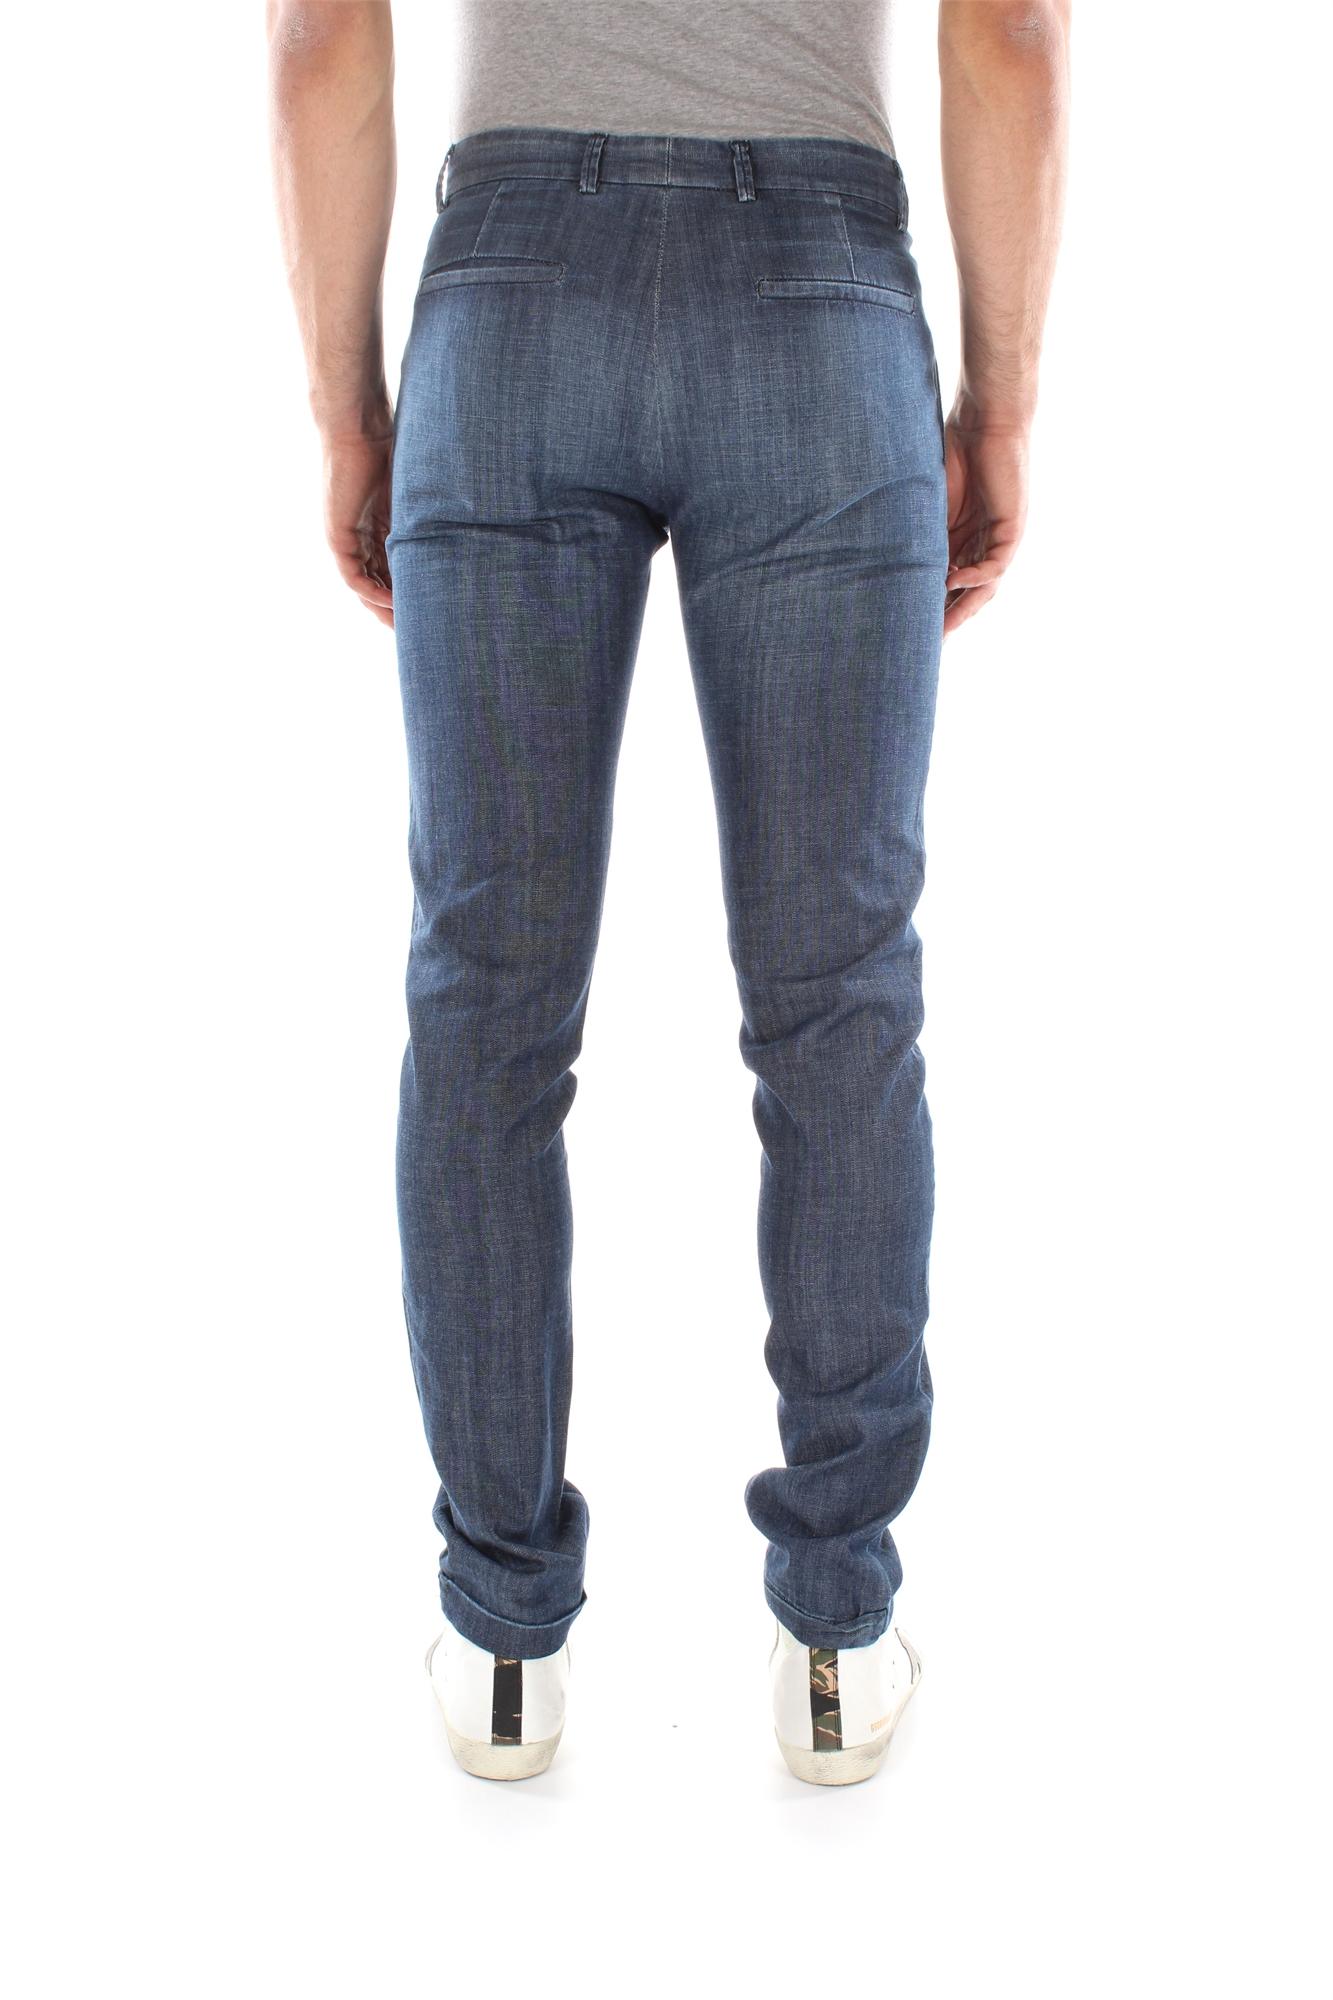 jeans pierre balmain herren baumwolle blau 6m210008549700 ebay. Black Bedroom Furniture Sets. Home Design Ideas